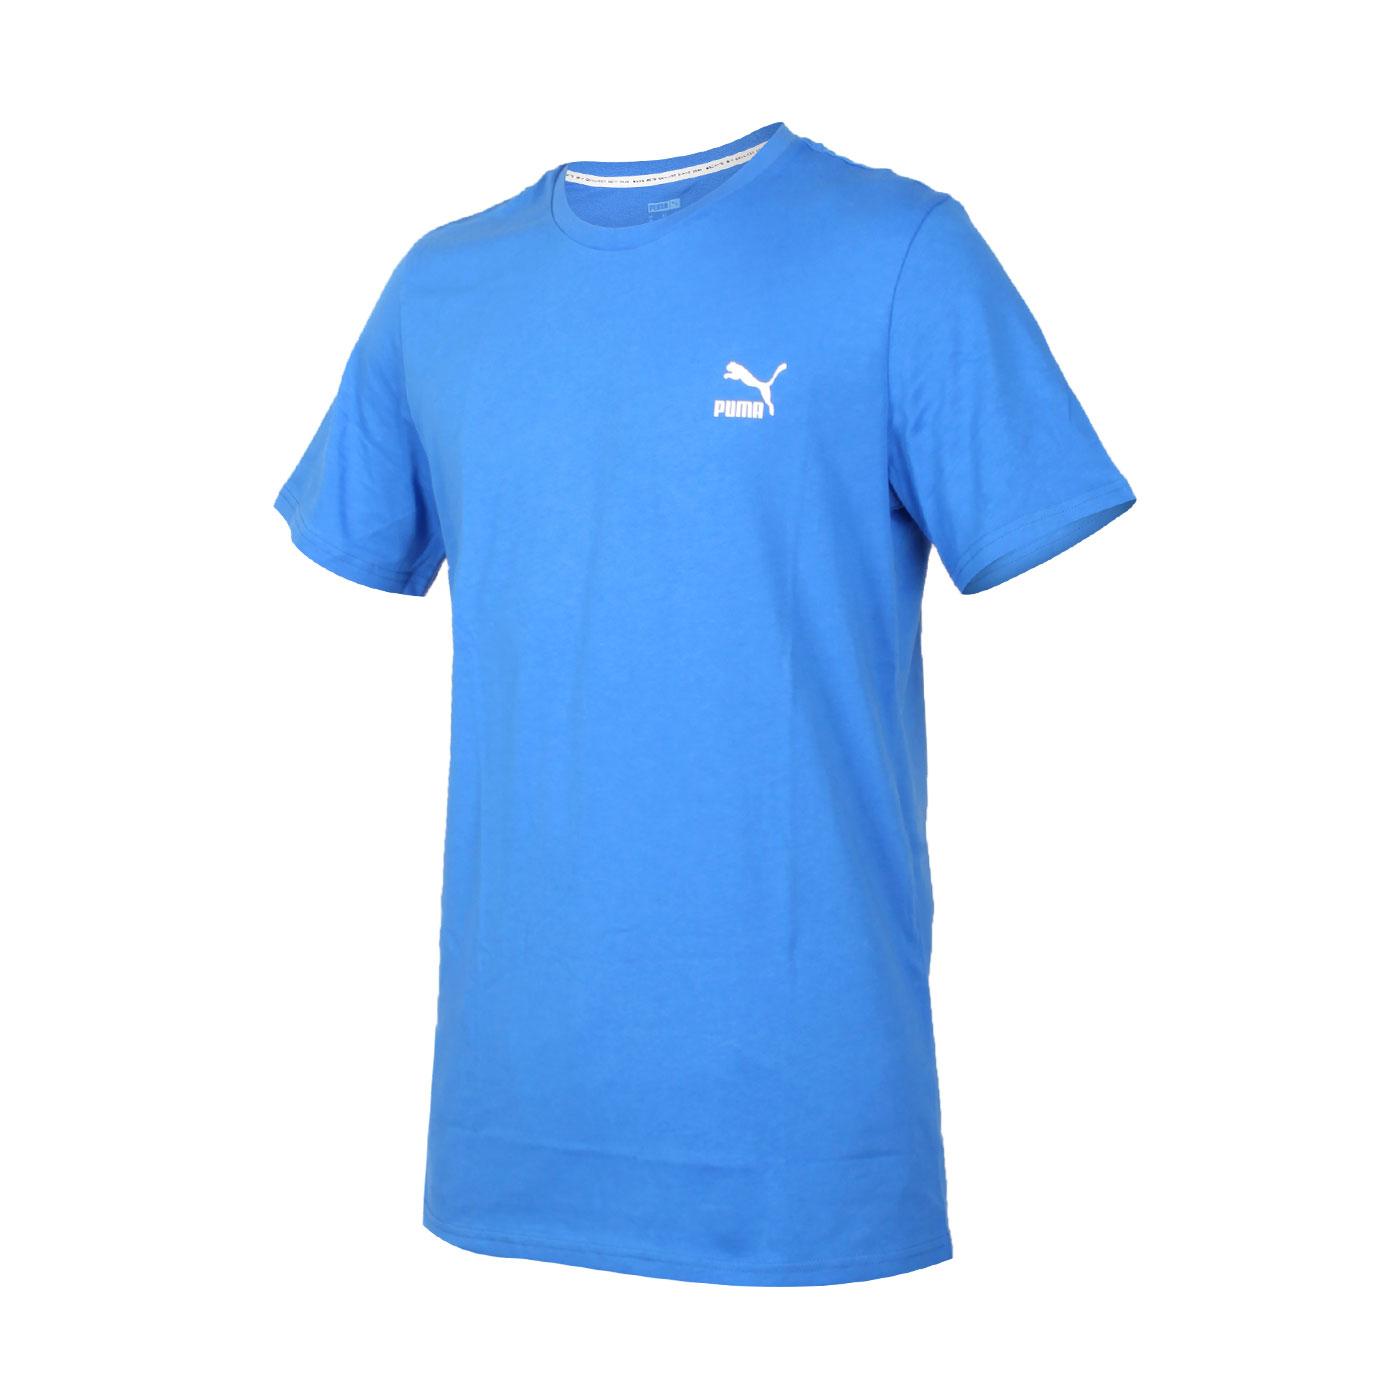 PUMA 男款流行系列短袖T恤 59862741